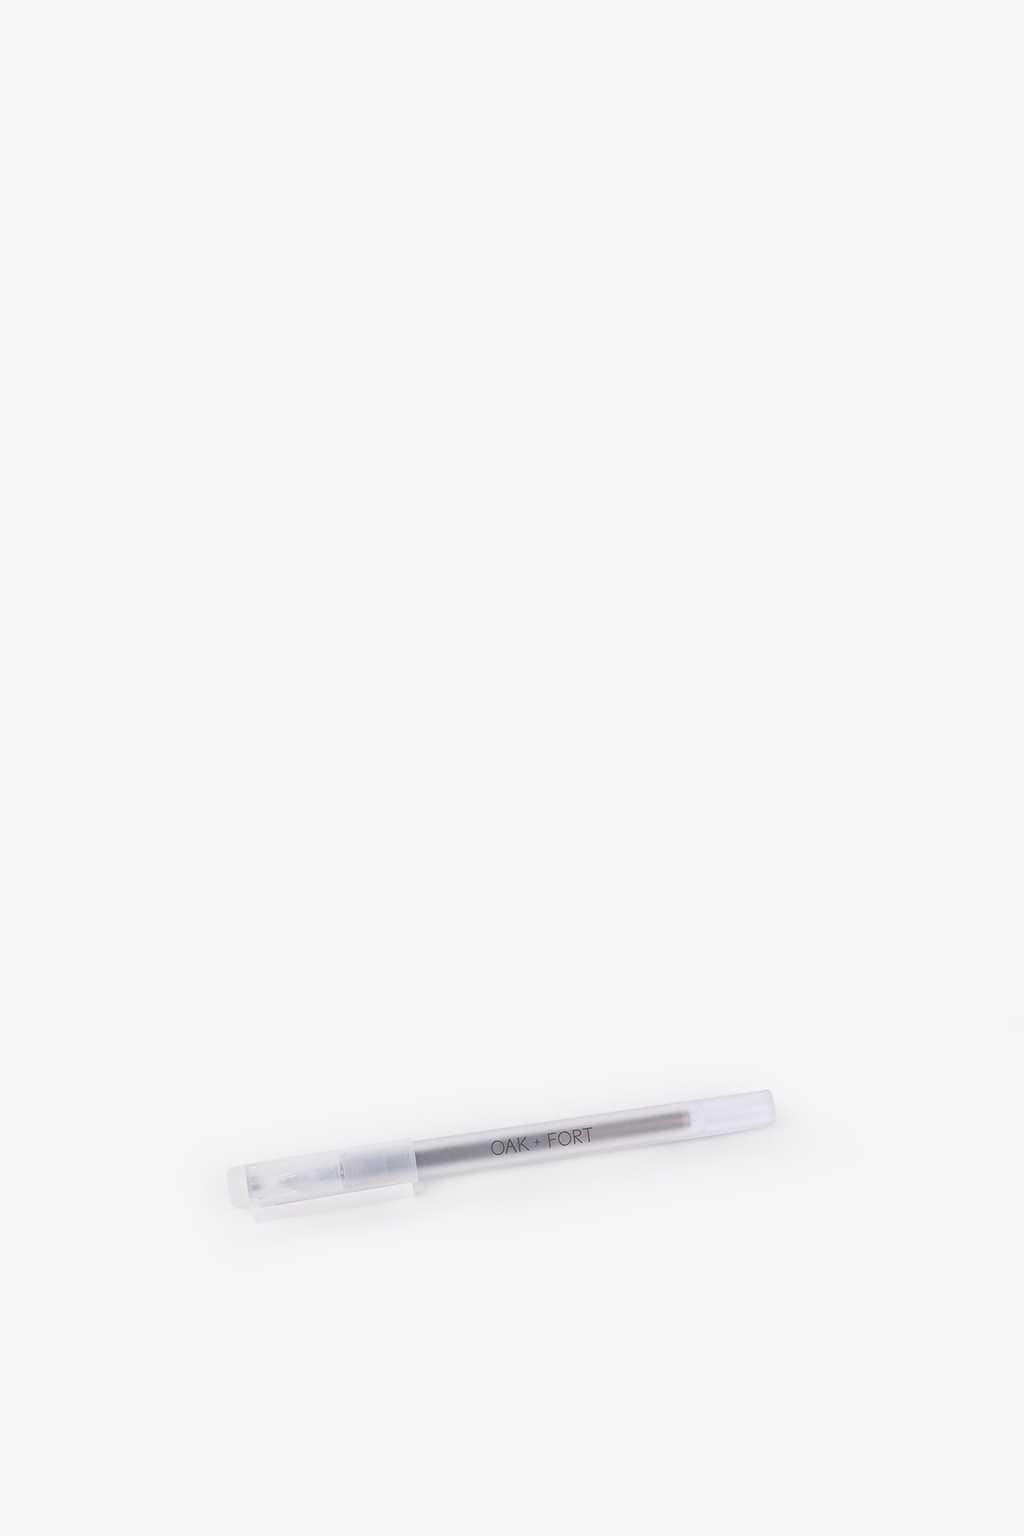 Erasable Pen 1861 Black 2